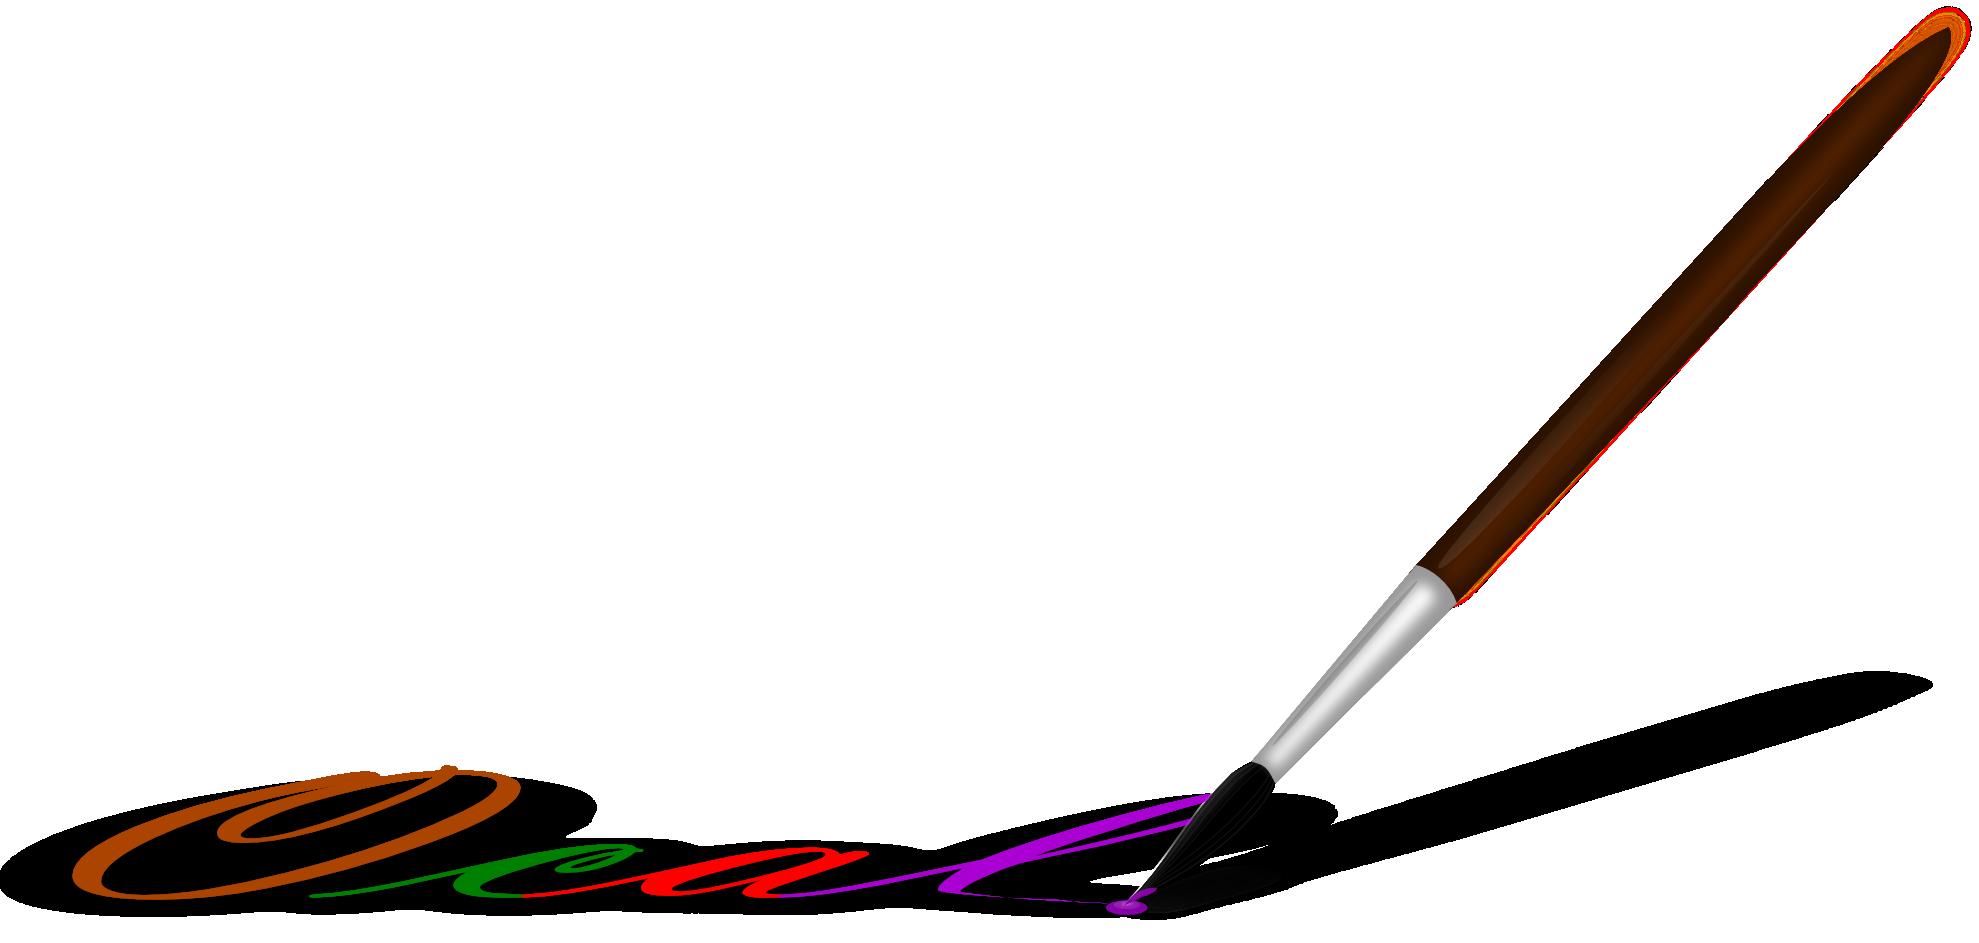 paint brush clip art free - photo #35